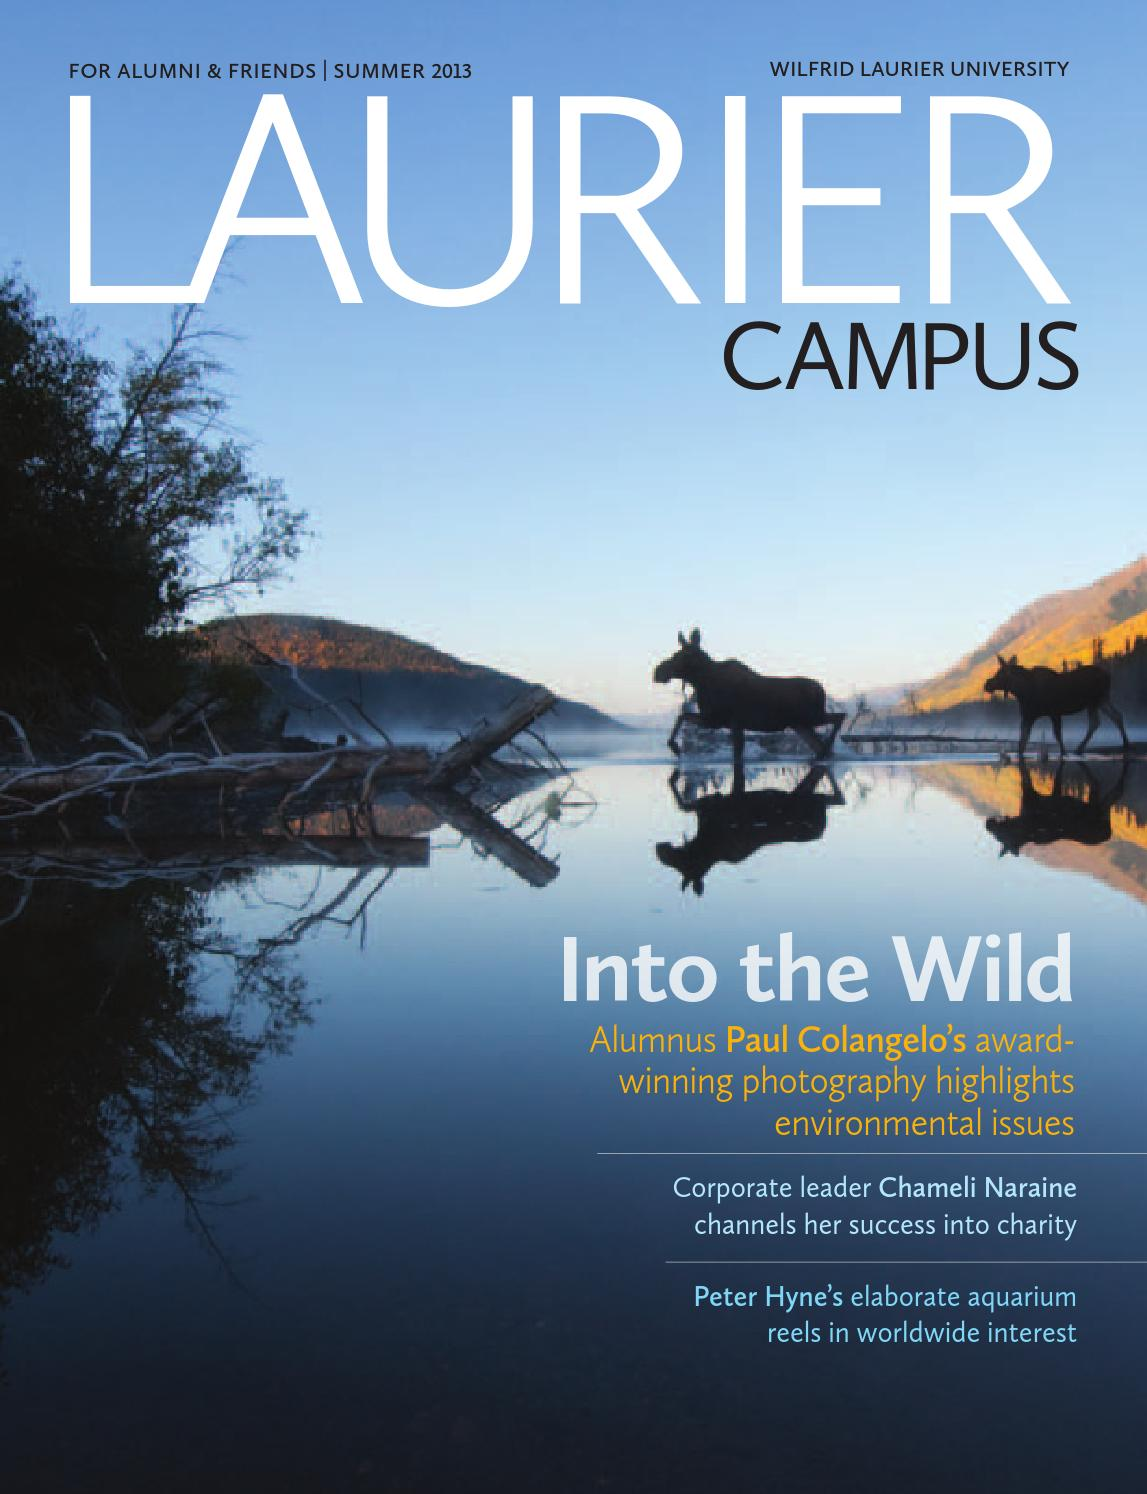 Summer 2013 Campus Magazine by Wilfrid Laurier University - issuu